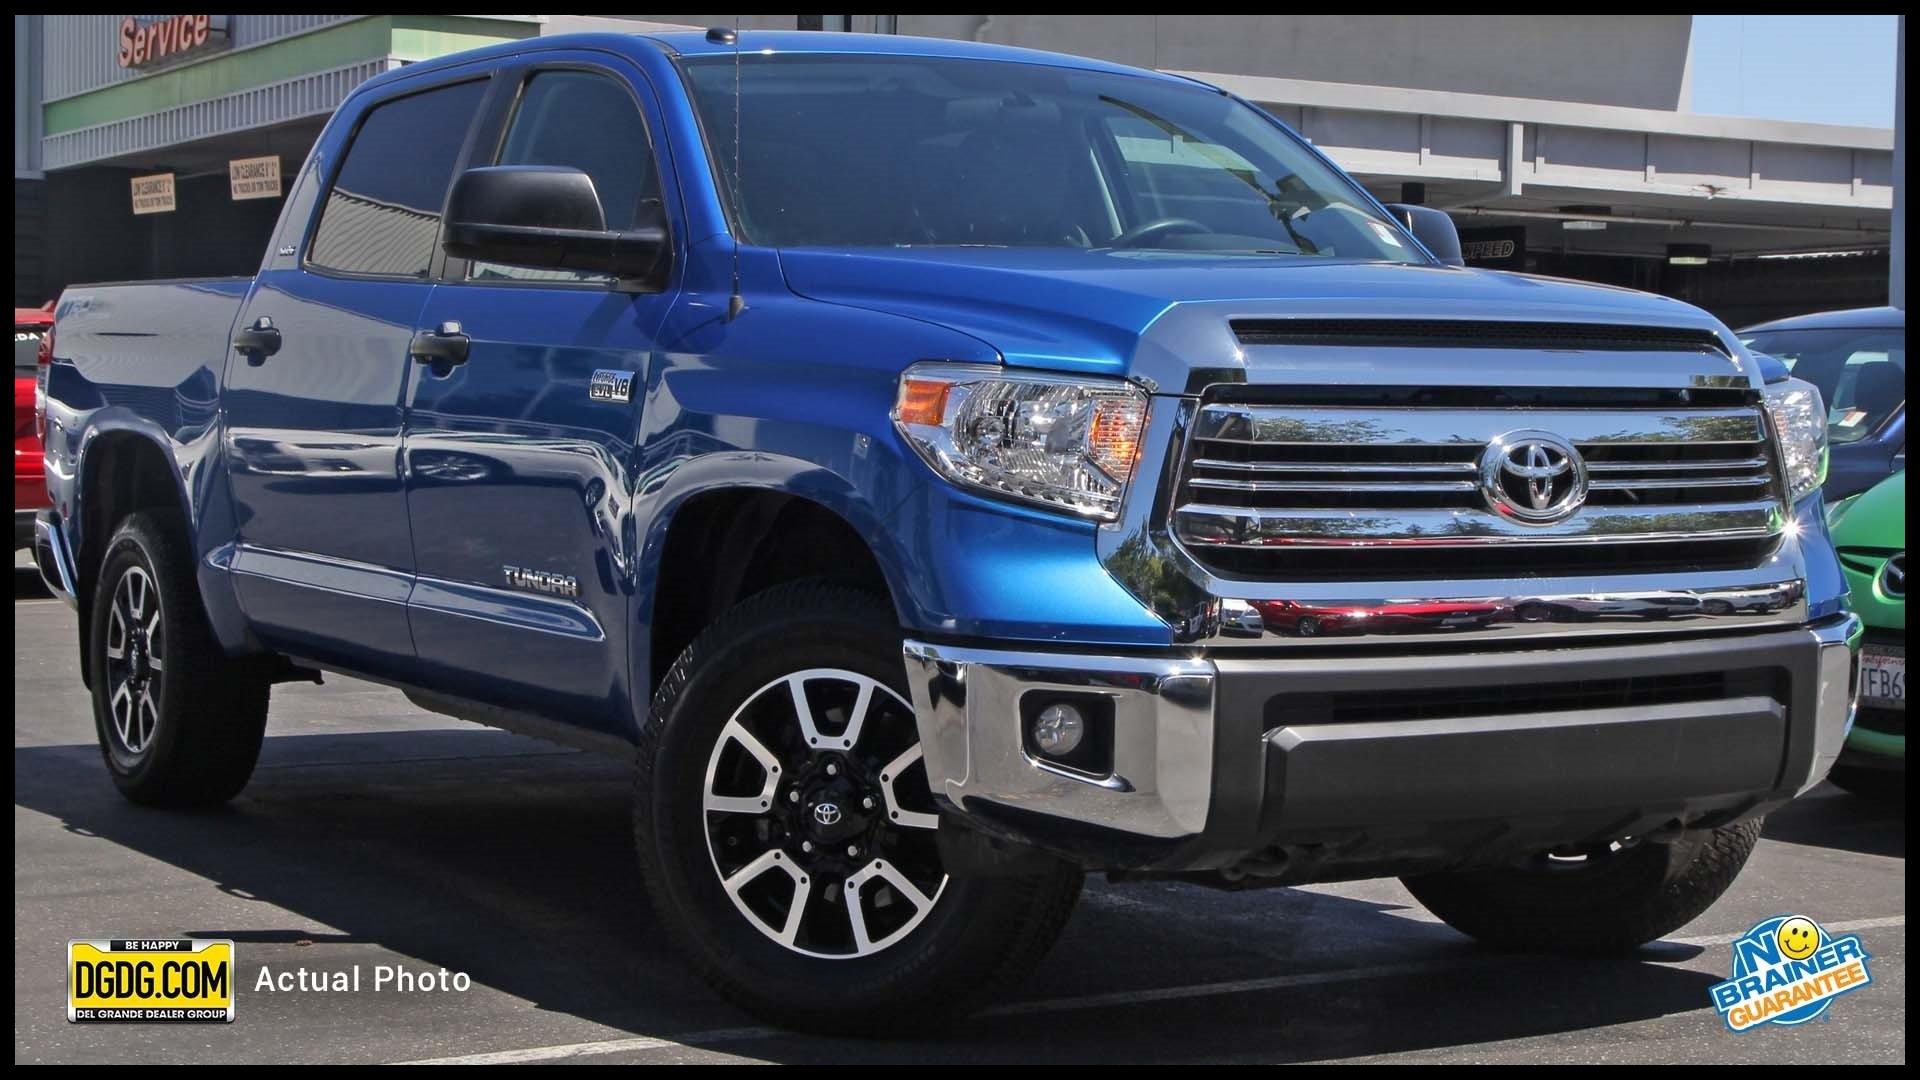 2006 toyota Corolla Blue Book Value Pre Owned 2016 toyota Tundra 4wd Truck Sr5 Crew Cab